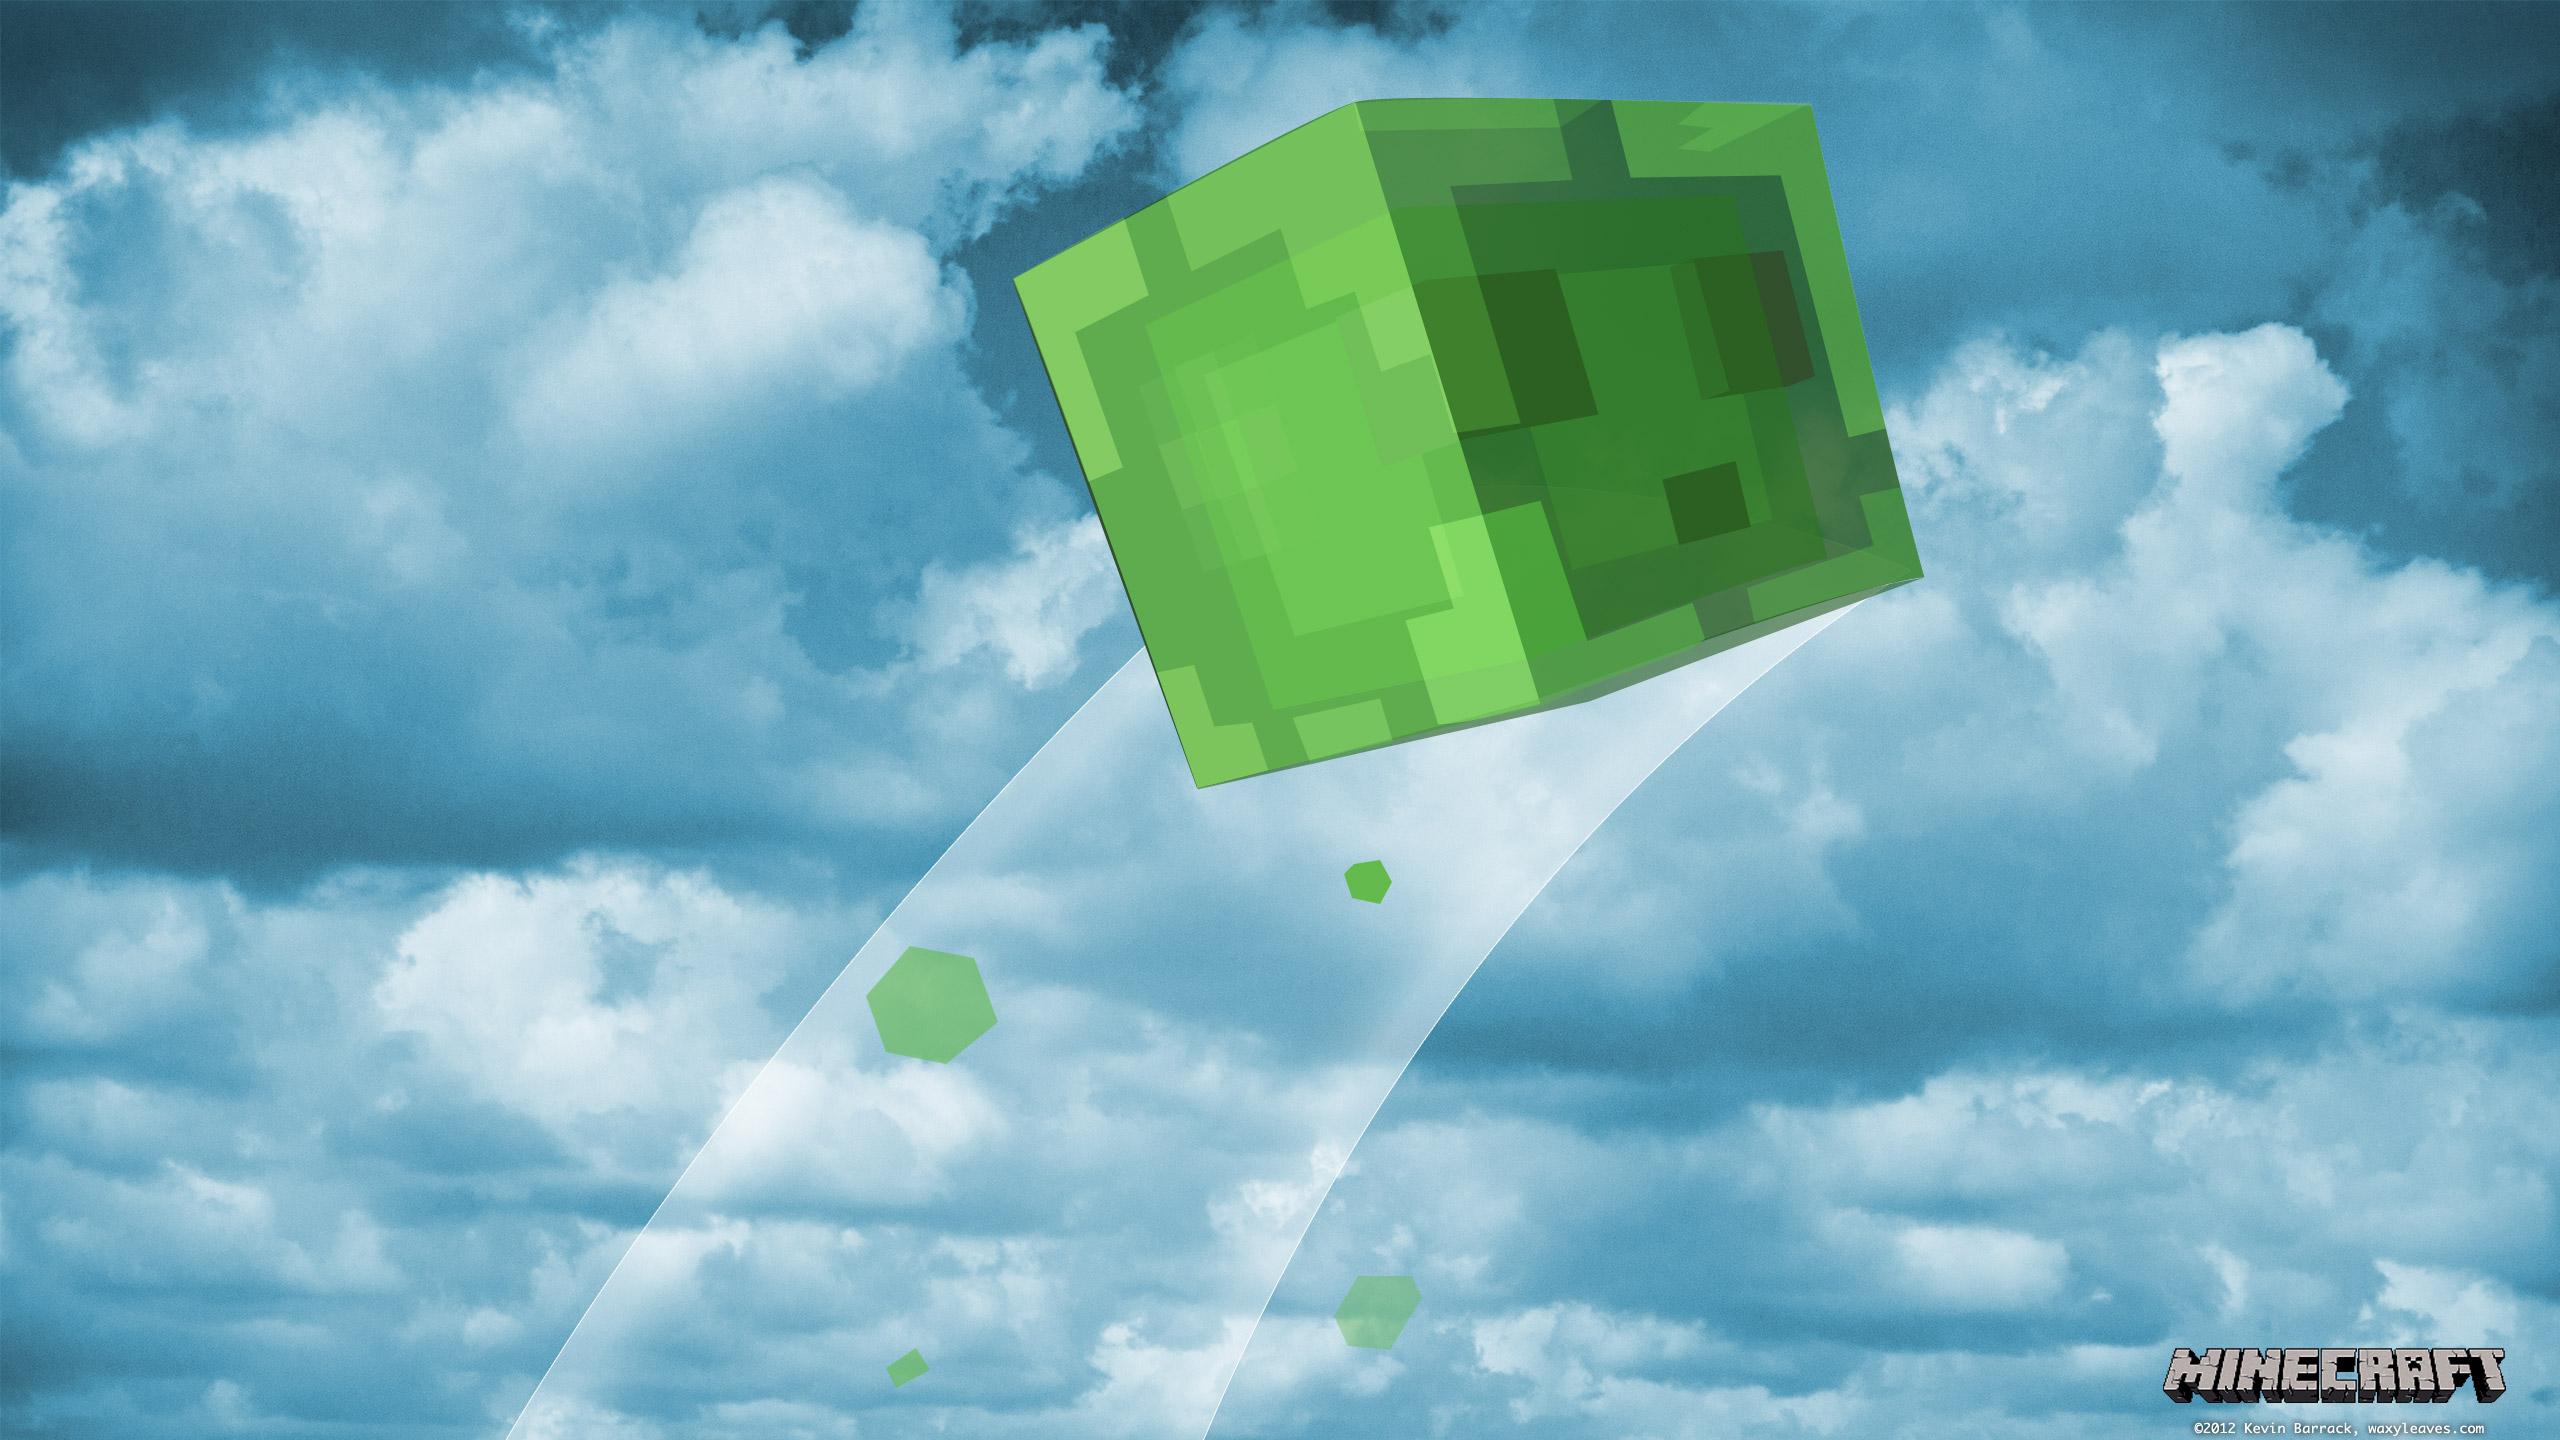 Cool Wallpaper Minecraft Simple - slimesky2560x1440  Snapshot_461999.jpg